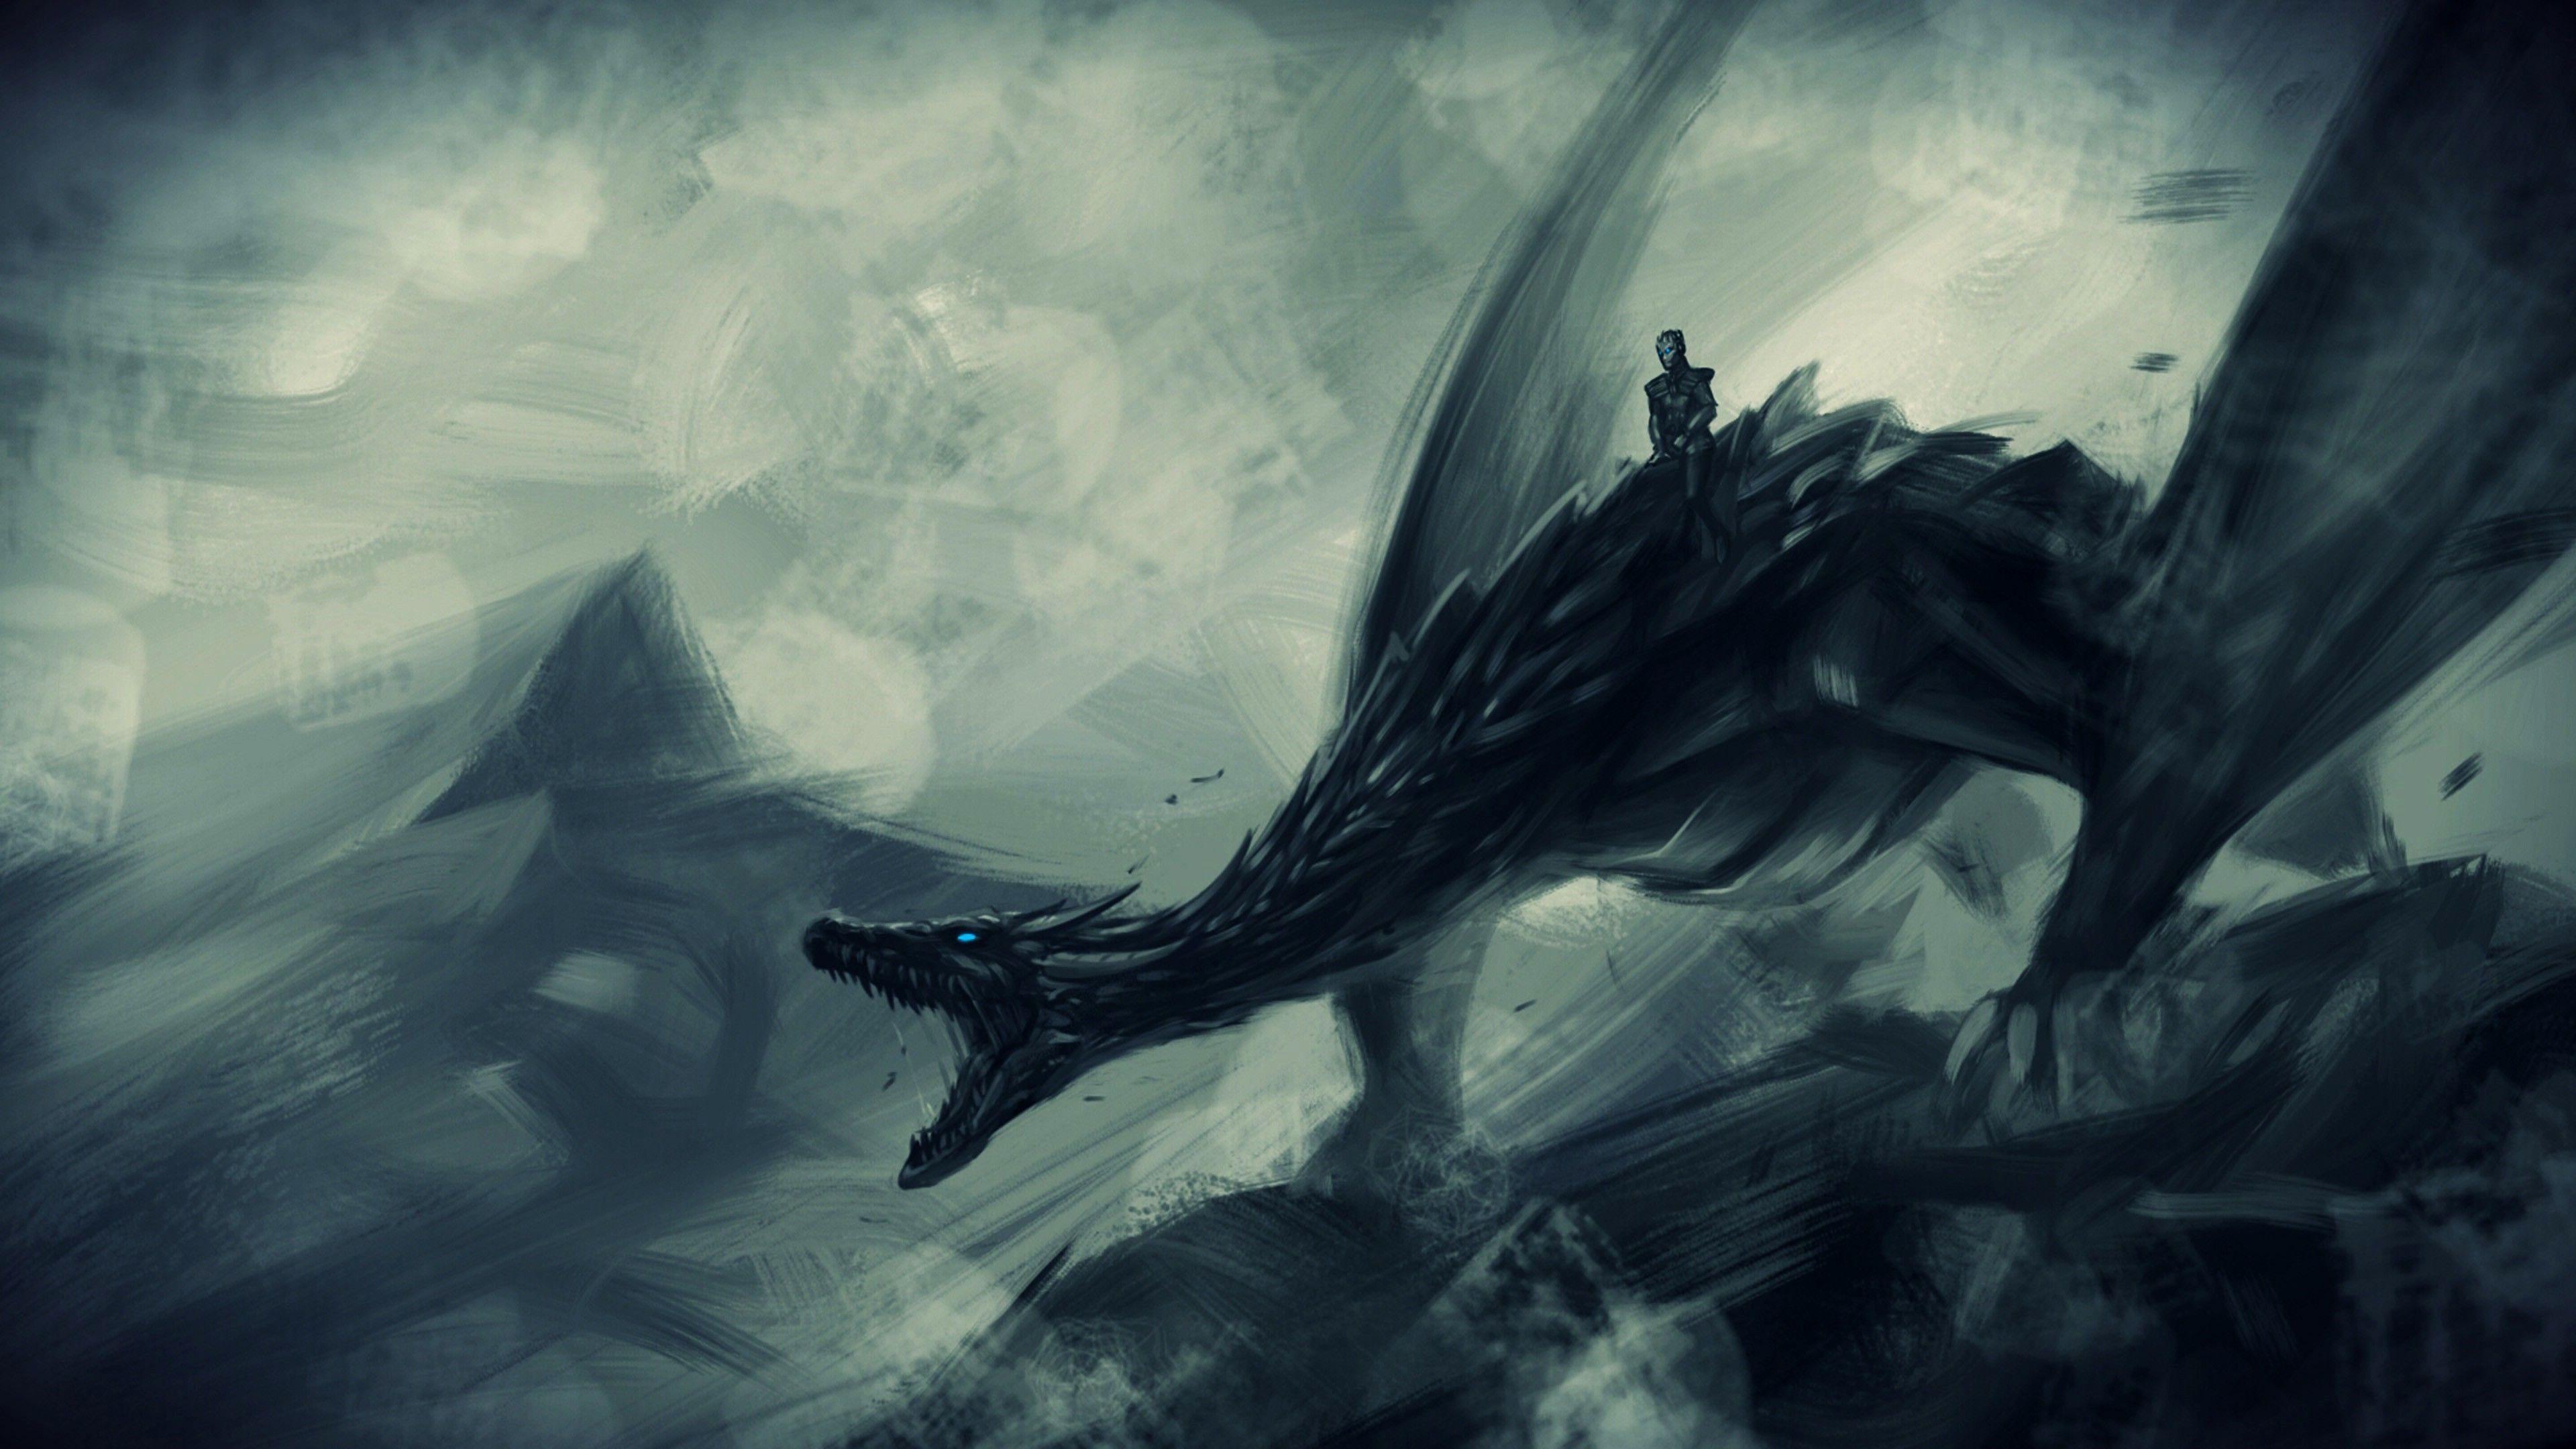 Got Wallpaper 4k Pc Ideas 4k In 2020 Ice Dragon Game Of Thrones Game Of Thrones Dragons Dragon Games